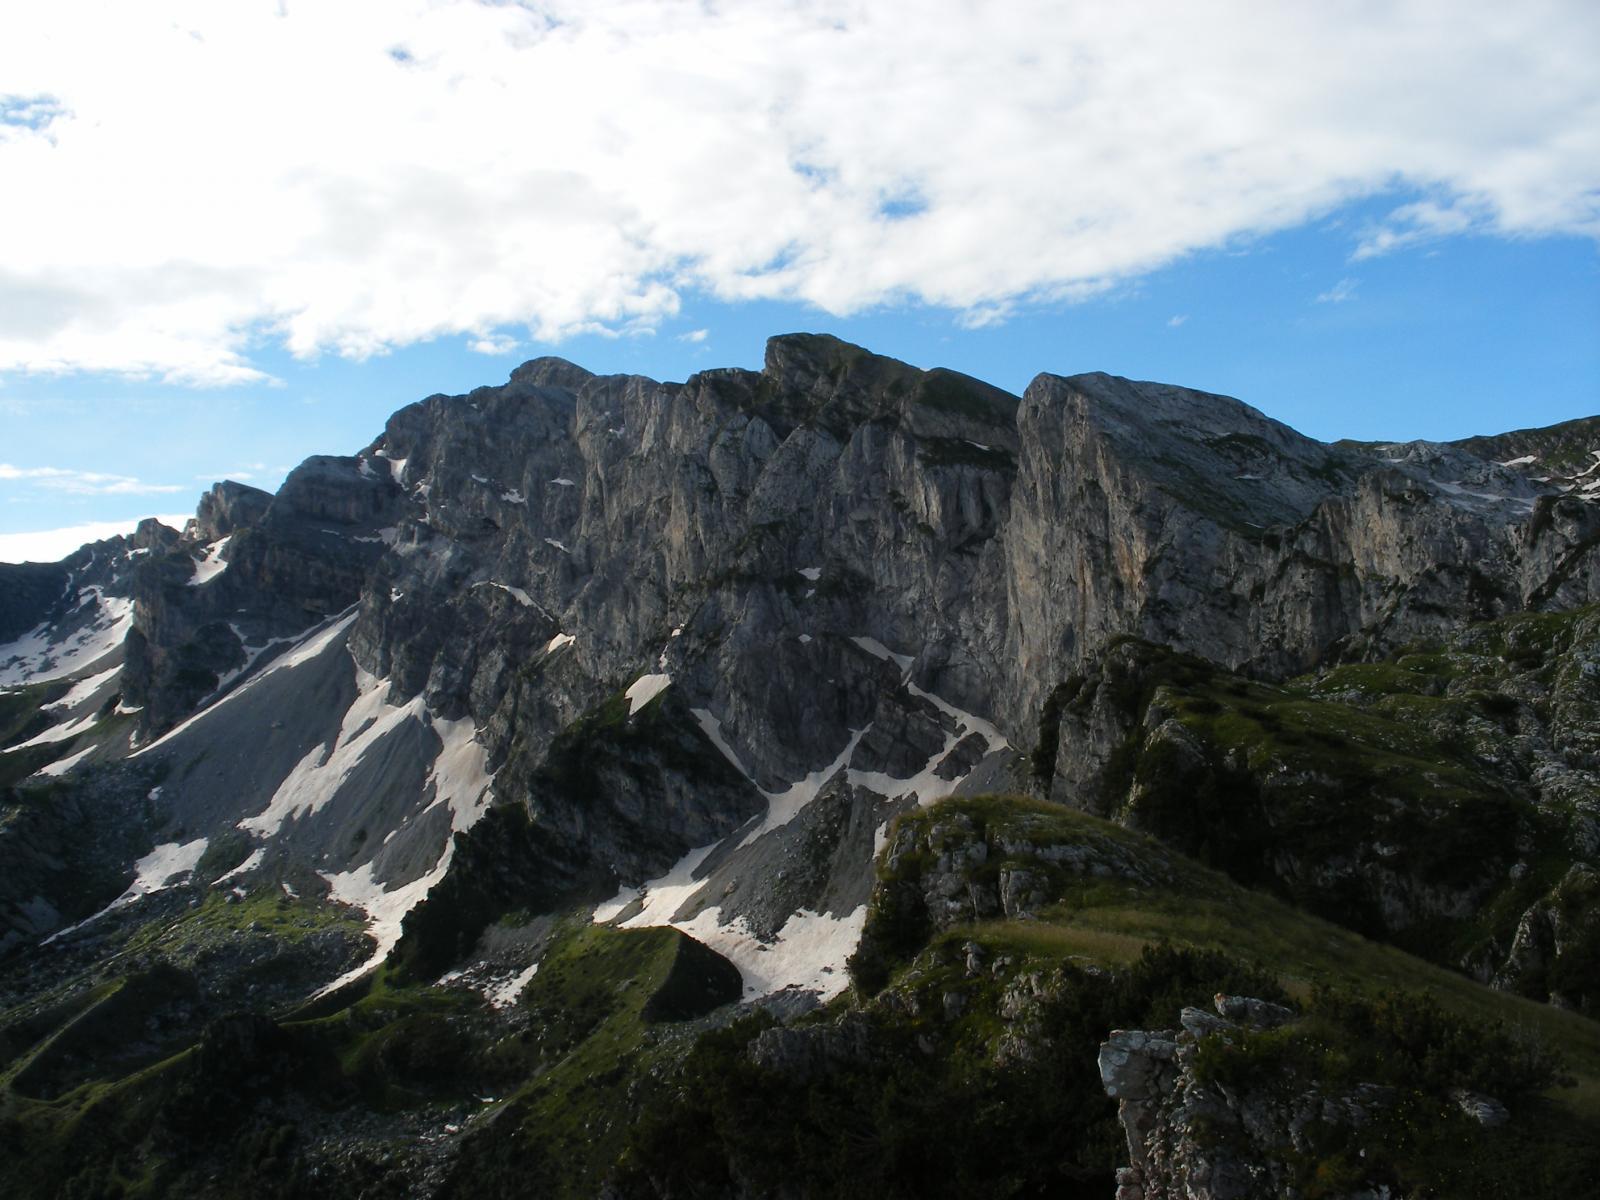 Marguareis (Punta) traversata di cresta dalla Testa del Duca a Punta Emma 2014-07-10